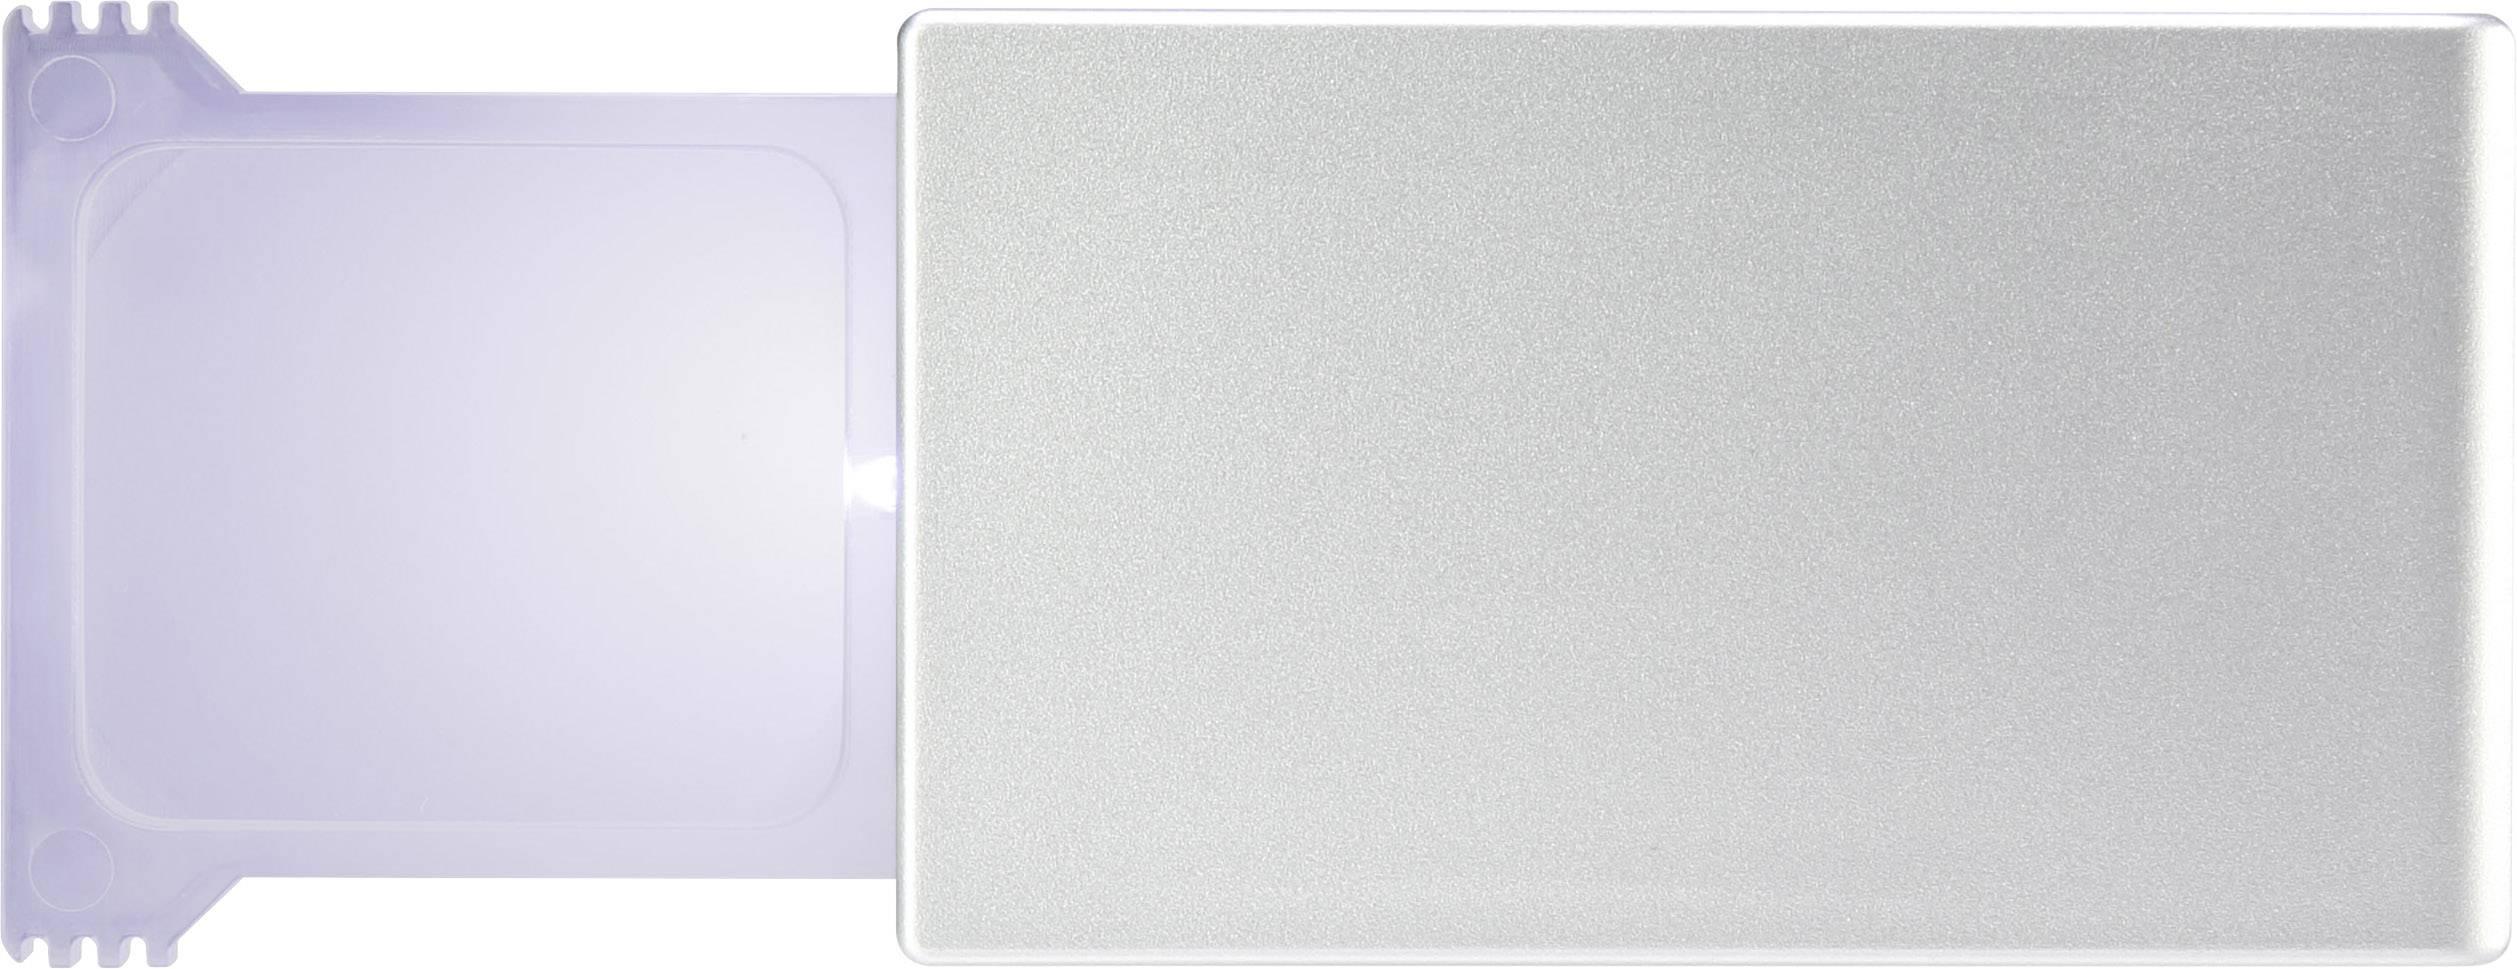 LED posuvný lupa 2x 44 x 39 mm TOOLCRAFT 1457115 2 x